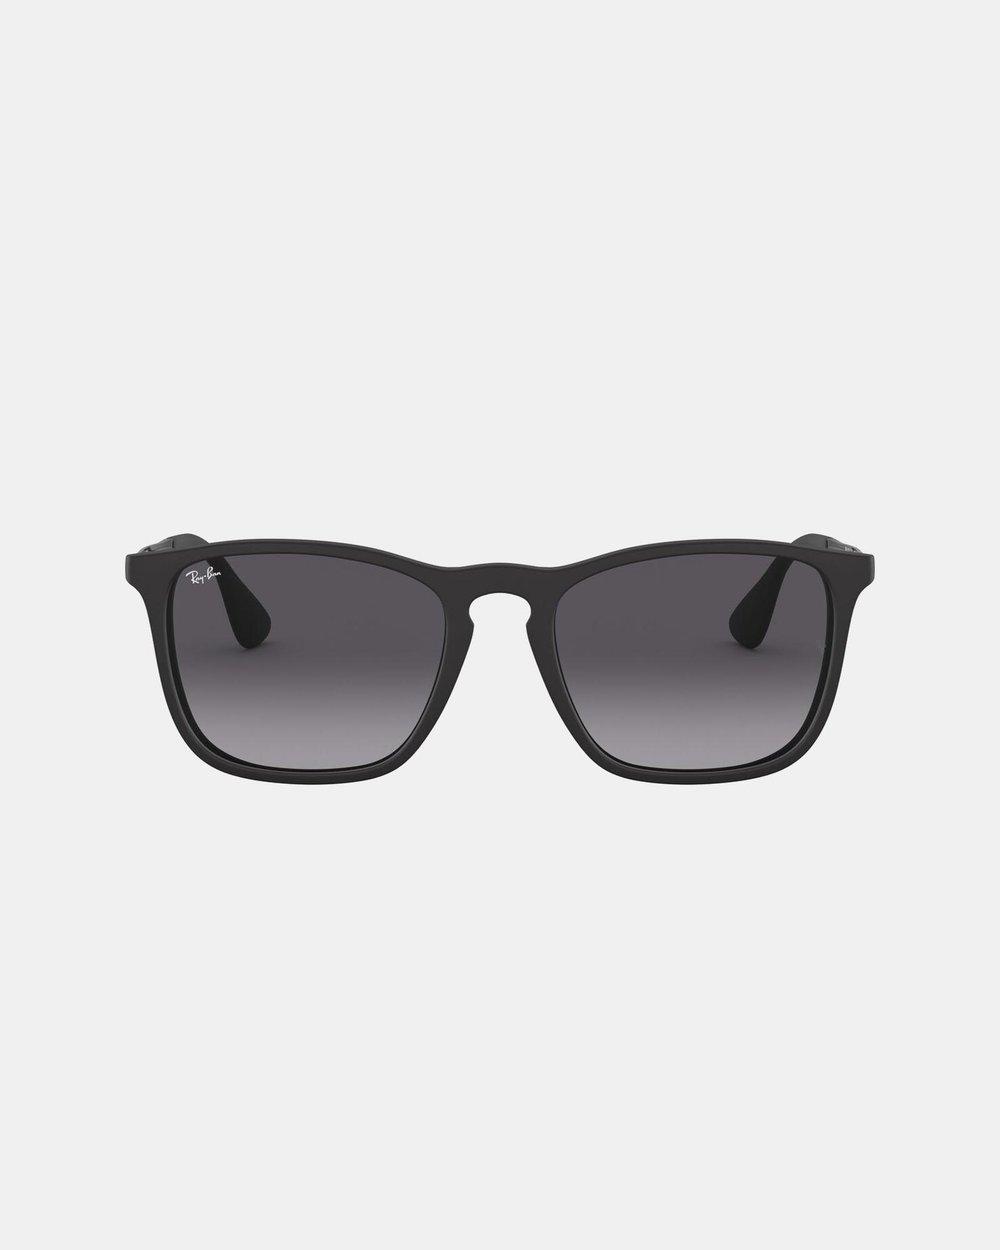 Ray ban sunglasses sale new zealand - Wayfarers Wayfarer Sunglasses Online Nz Buy Mens Wayfarer New Zealand The Iconic